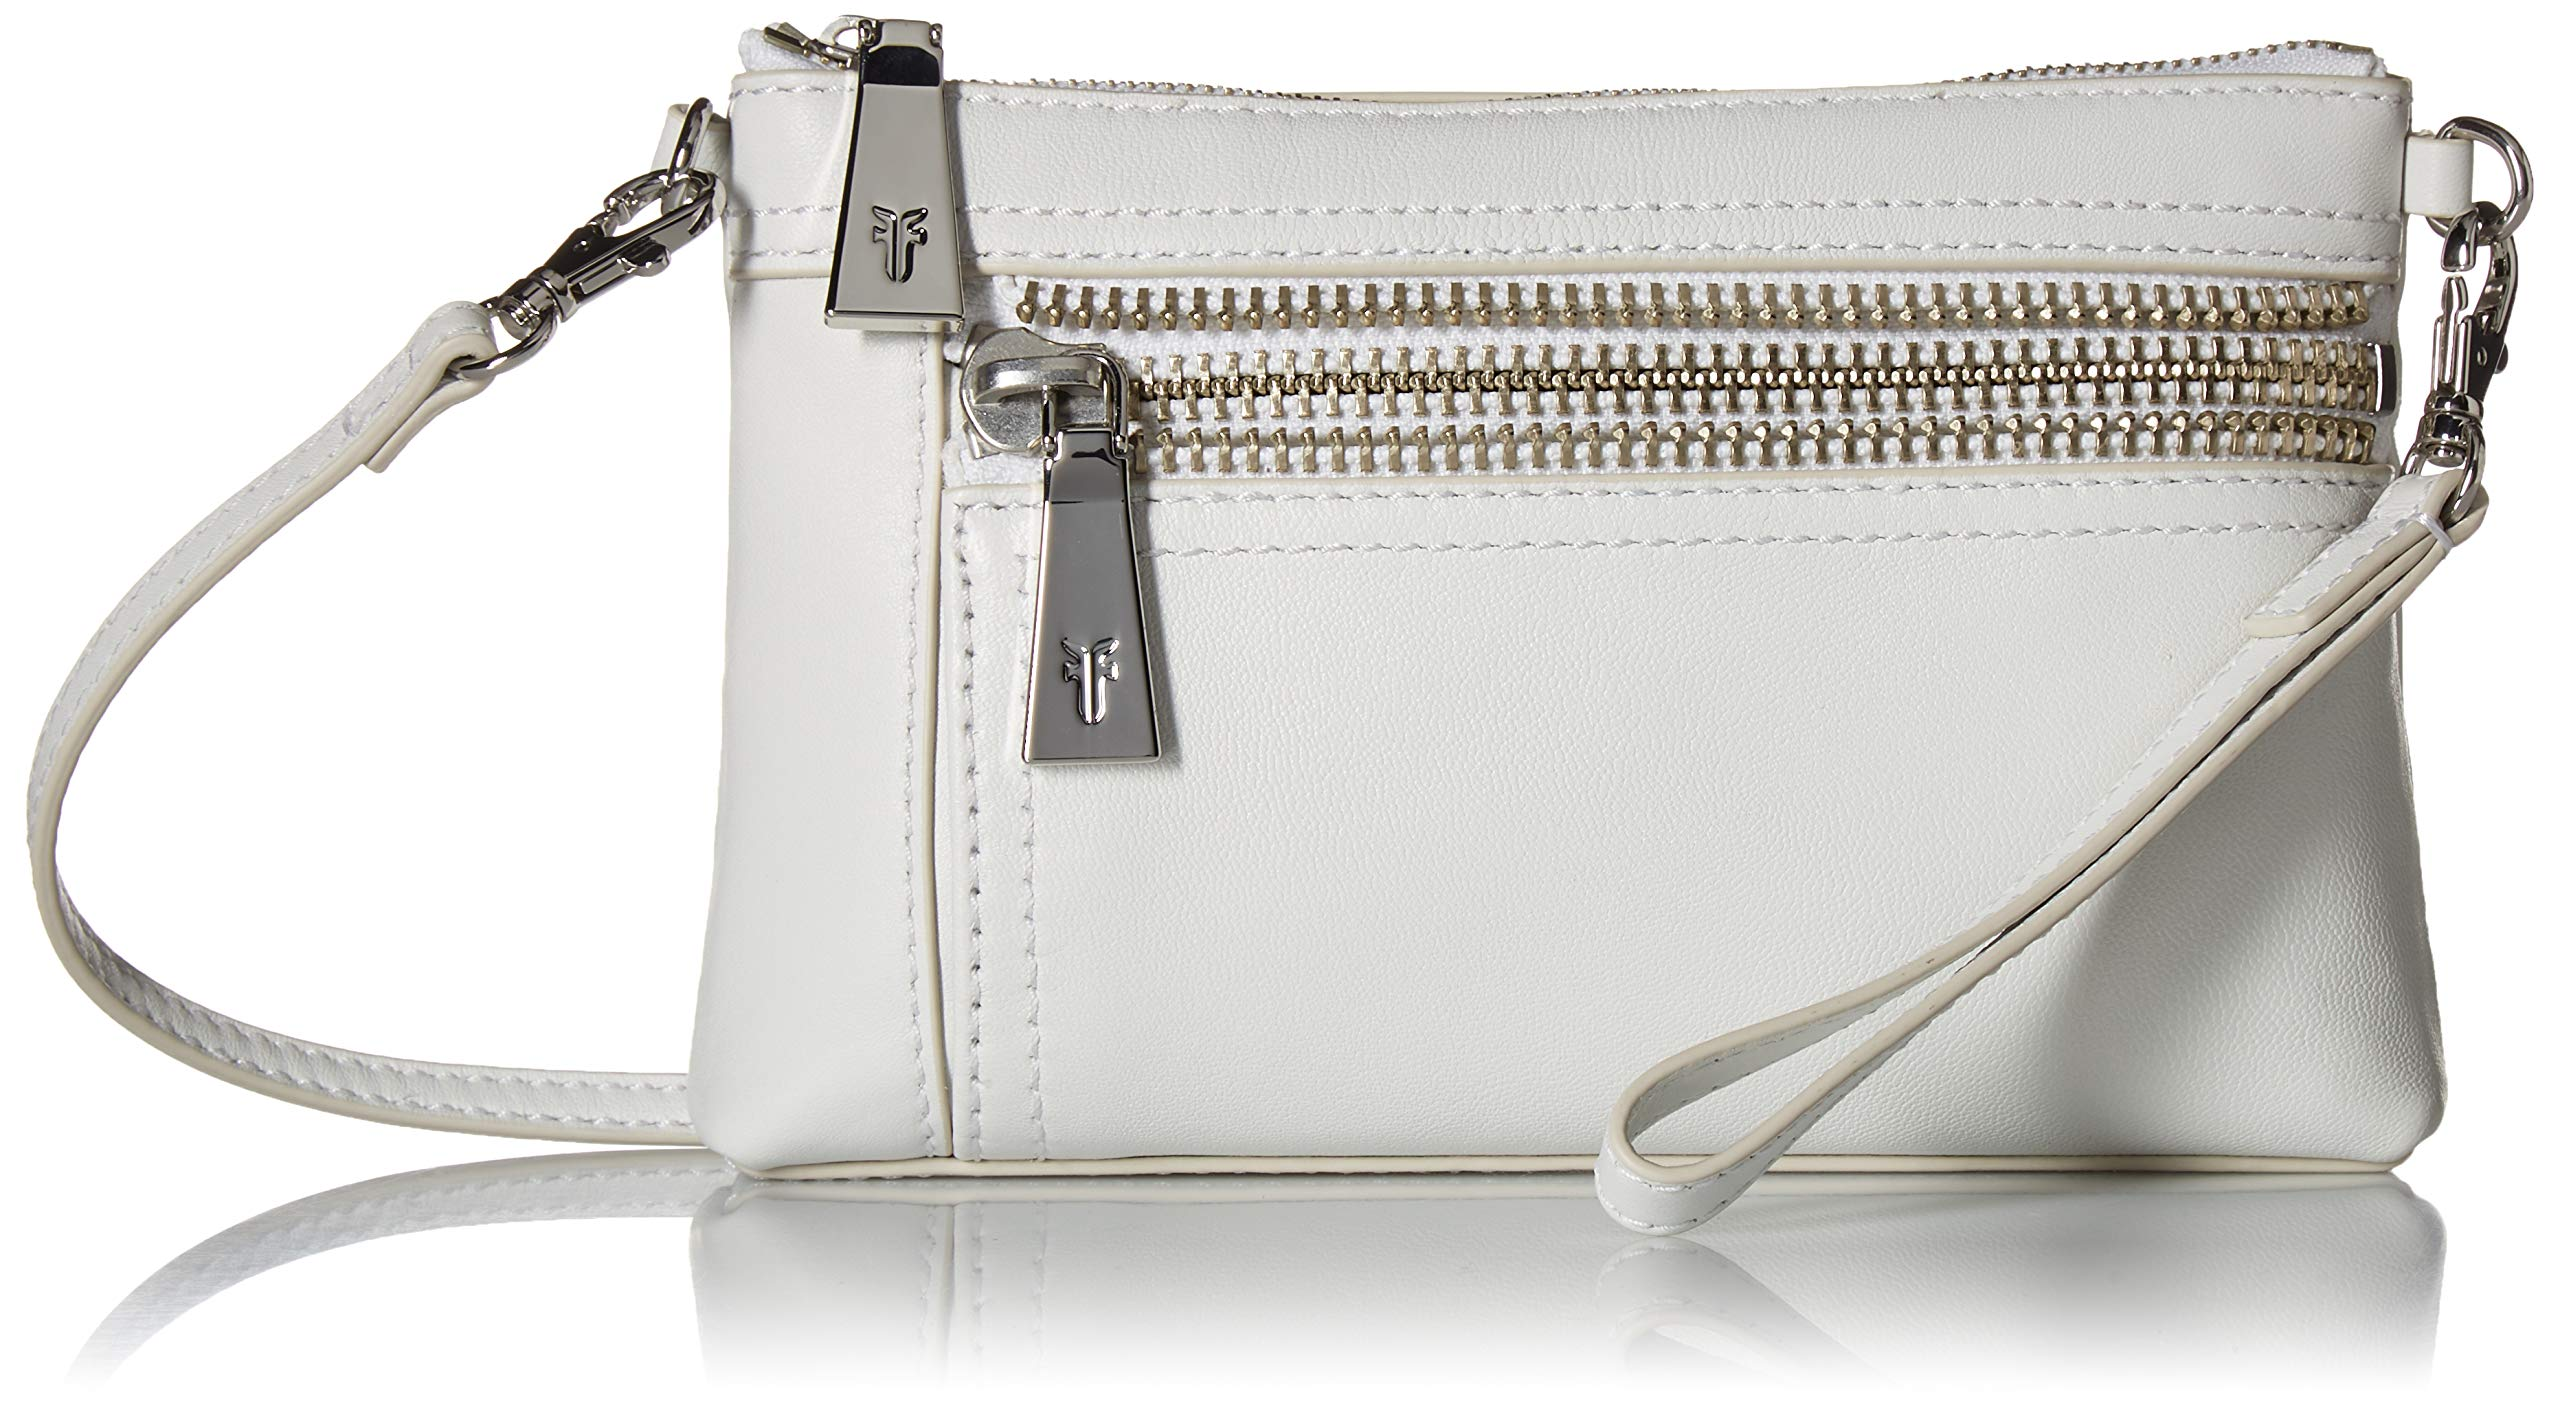 FRYE Lena Zip Leather Crossbody Wristlet Bag, white